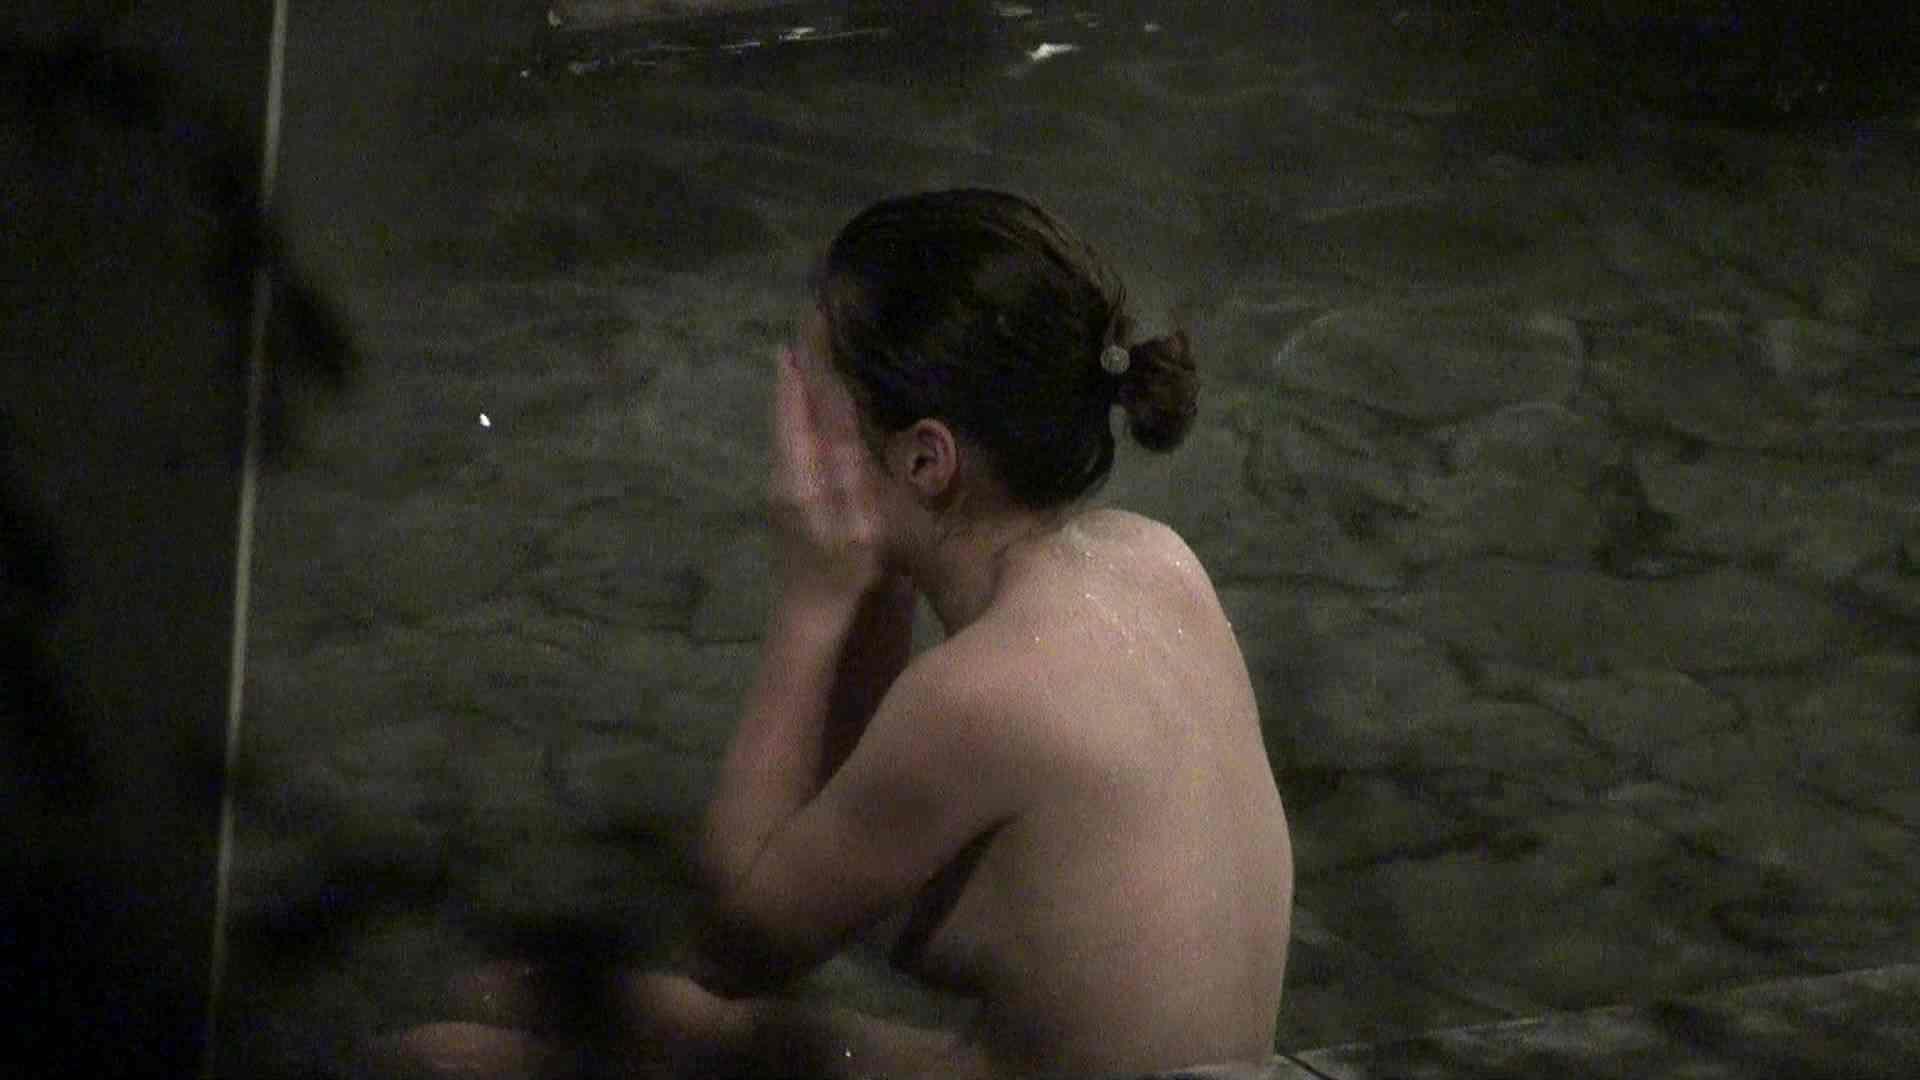 Aquaな露天風呂Vol.391 美しいOLの裸体 えろ無修正画像 99pic 50